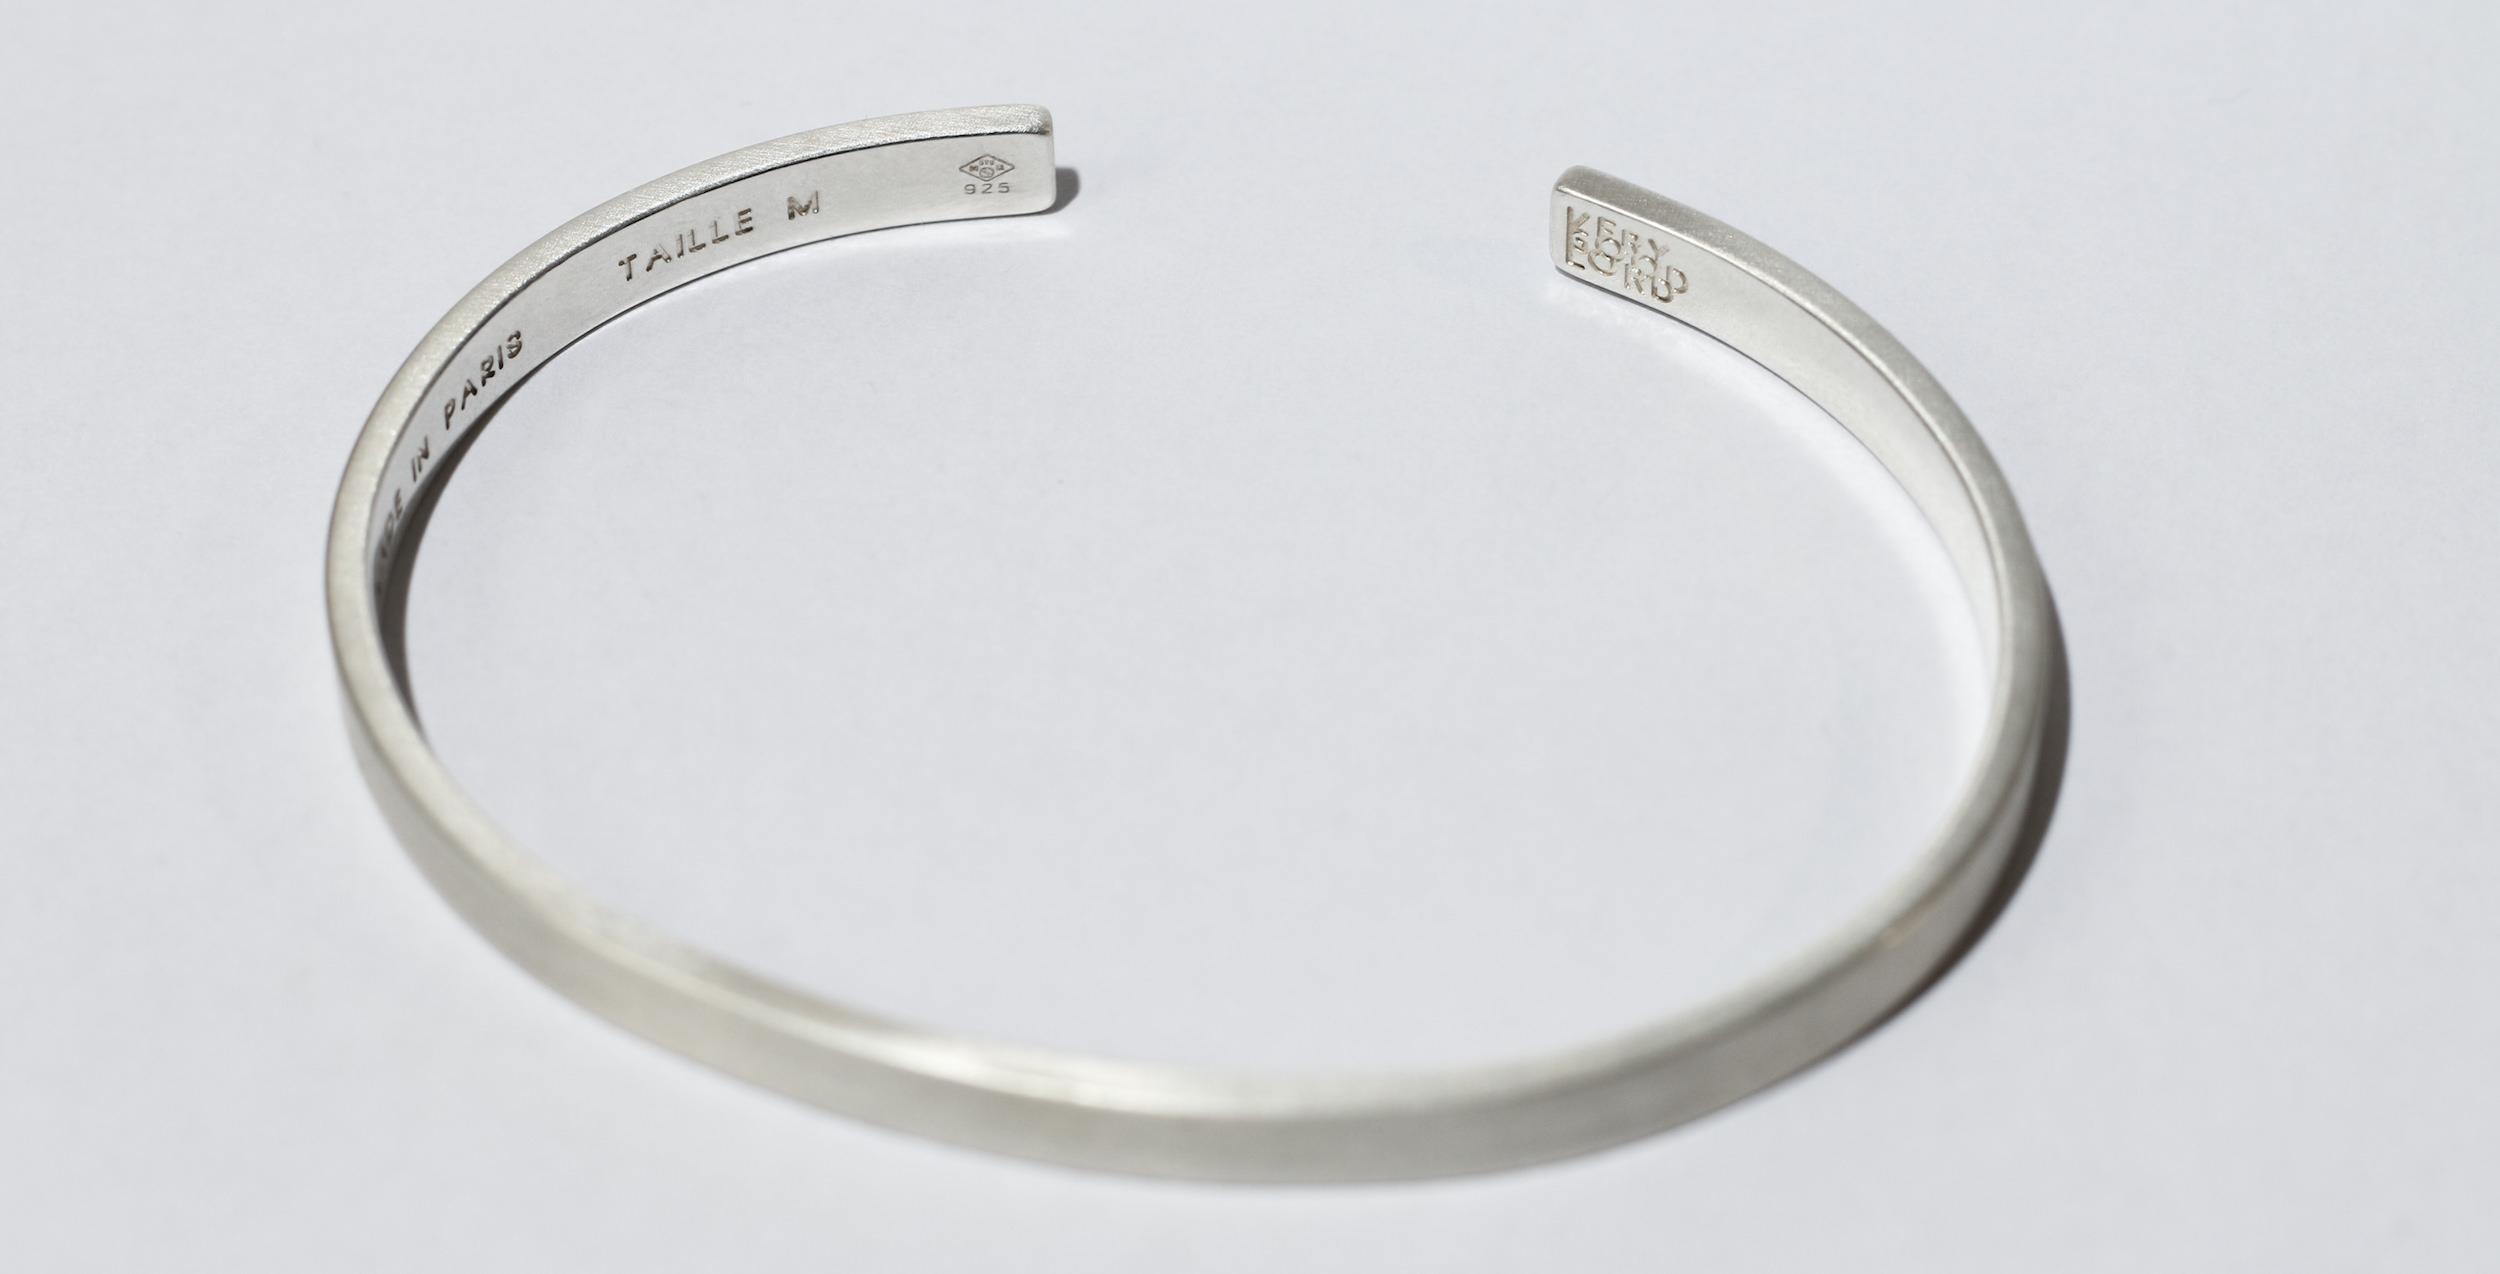 nettoyer son bracelet en argent bijoux la mode. Black Bedroom Furniture Sets. Home Design Ideas